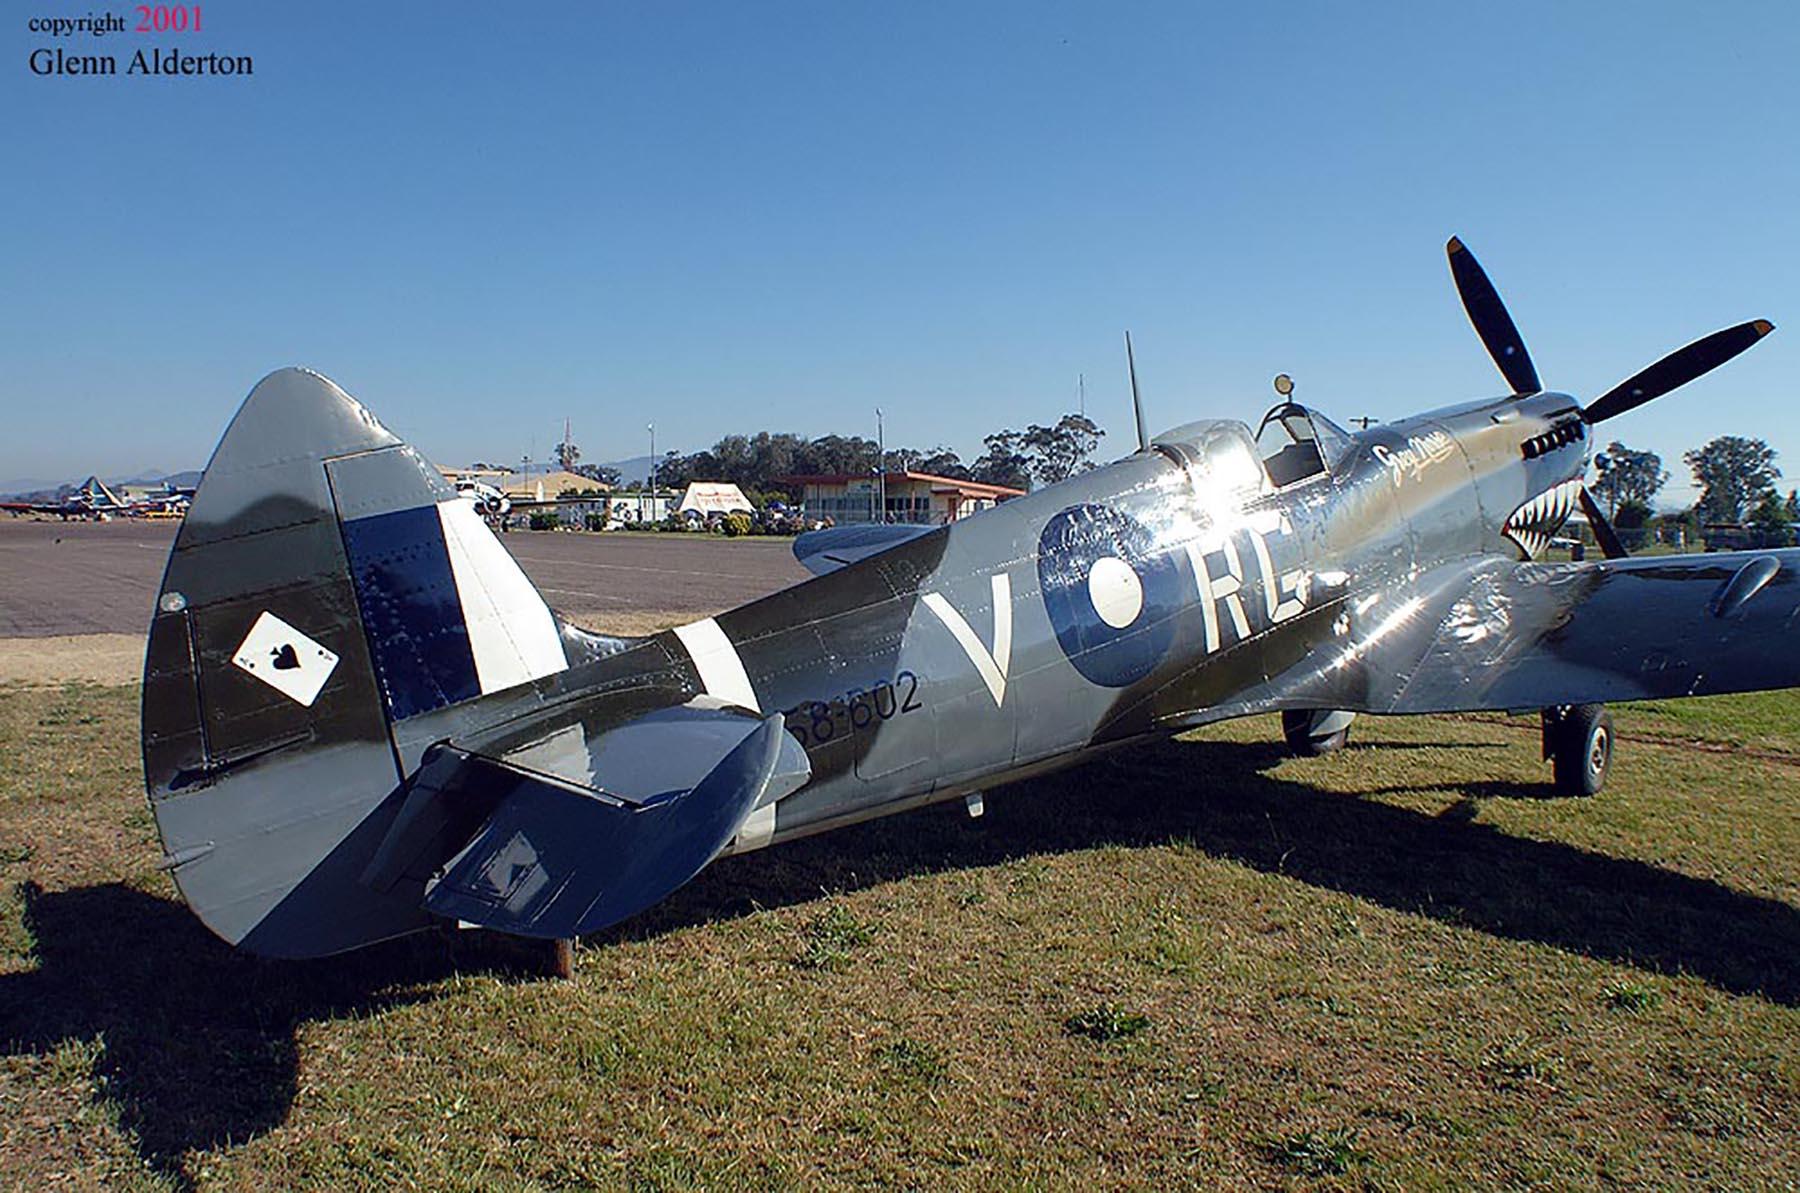 Airworthy Spitfire warbird RAAF 457Sqn RGV A58 602 06